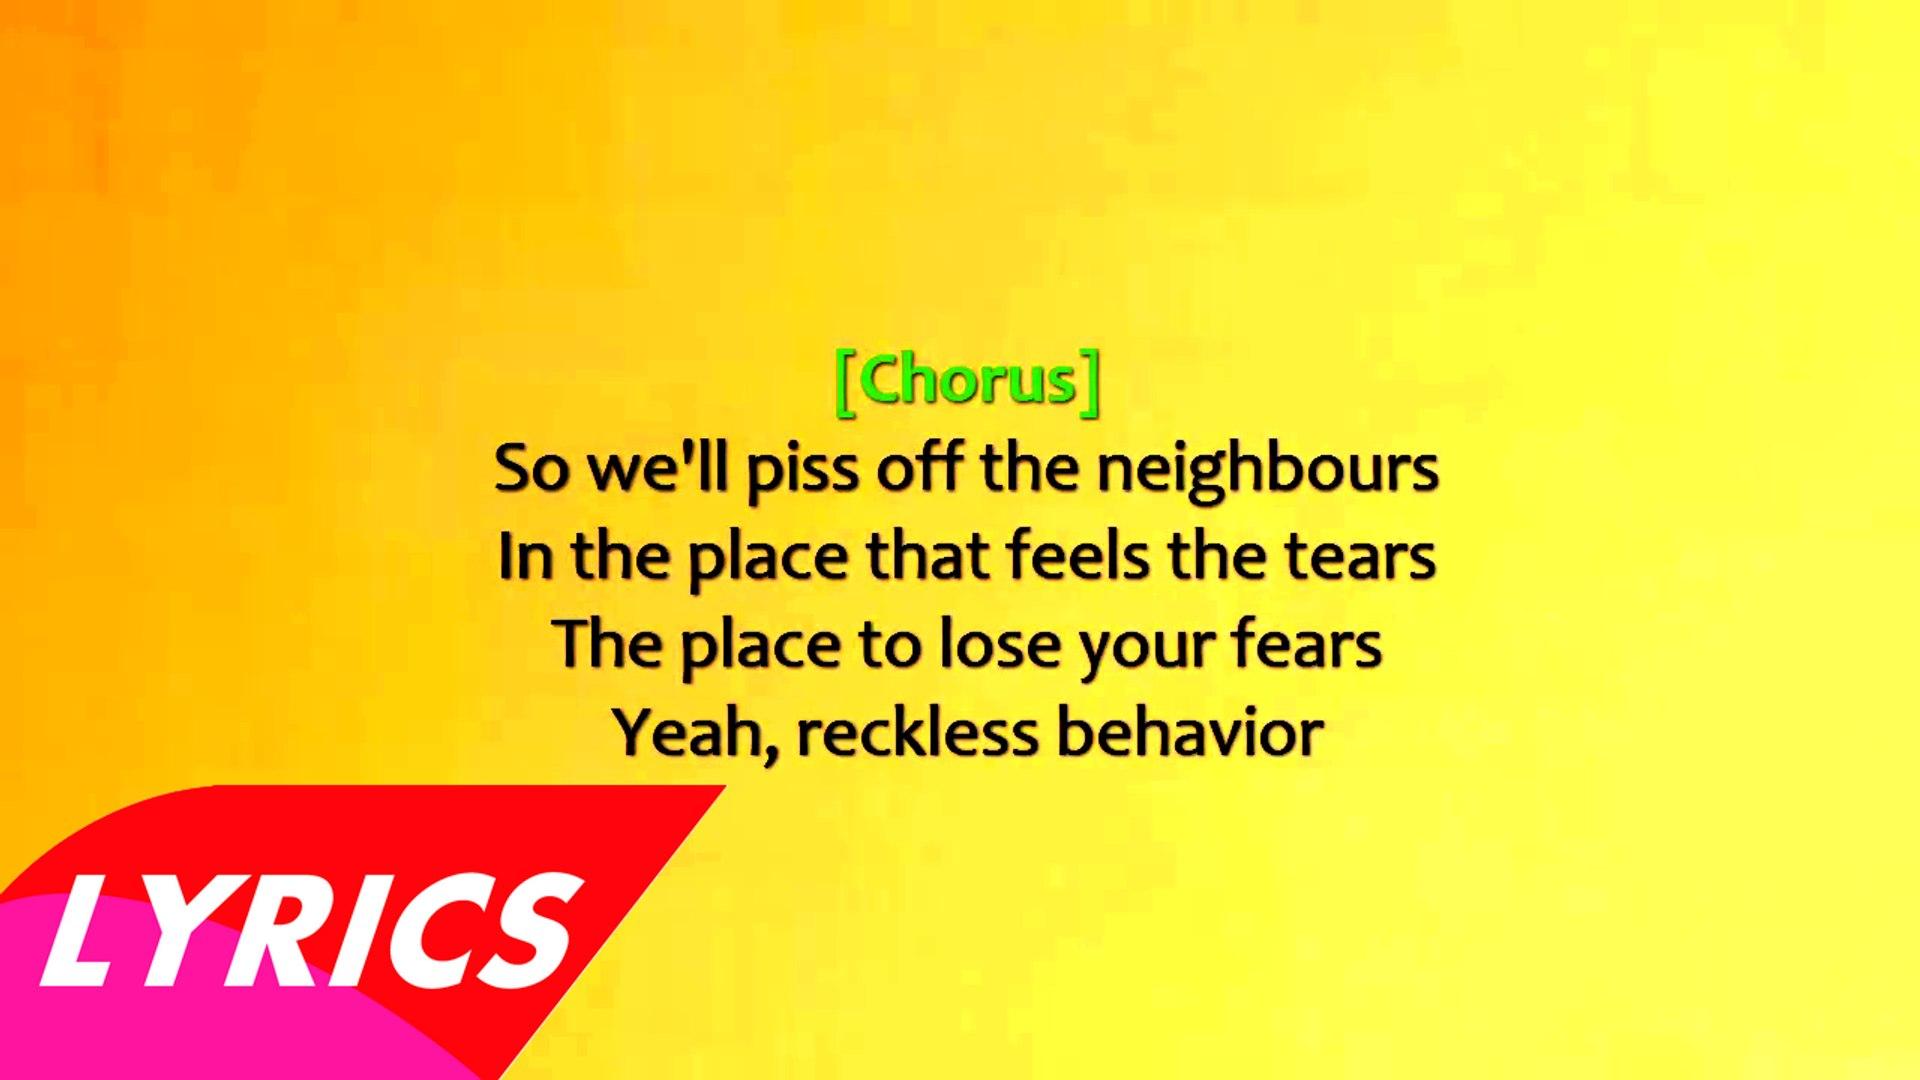 zayn malik pillowtalk lyrics video